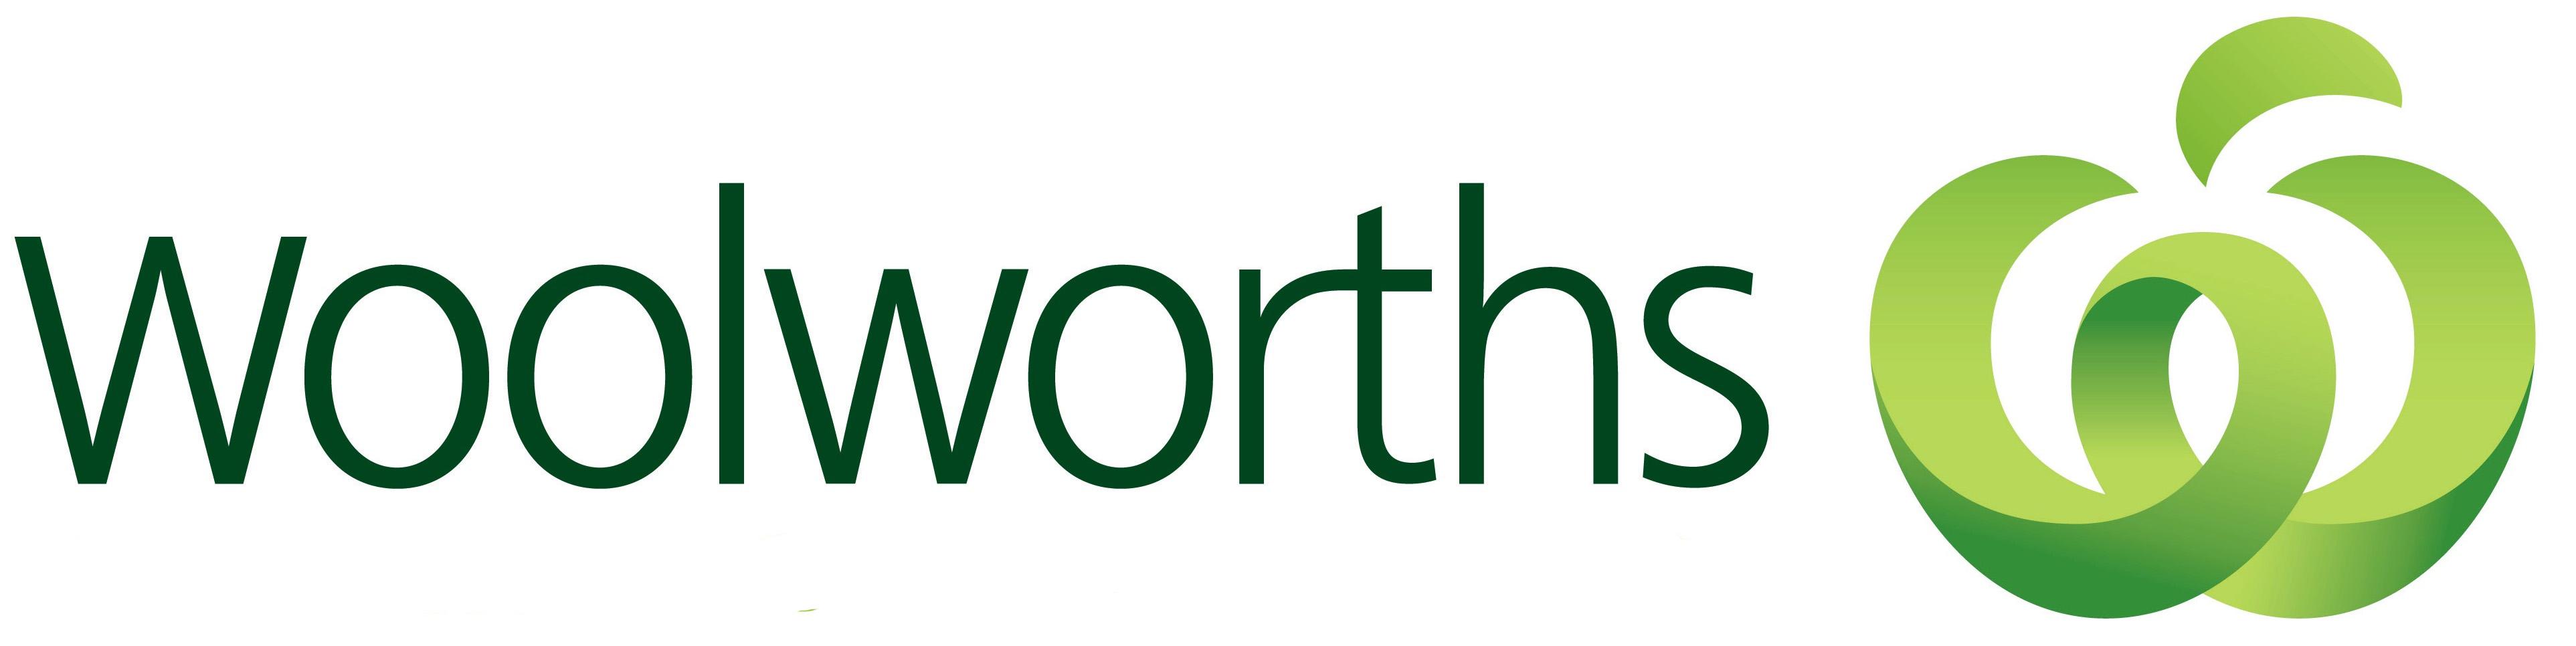 Image result for woolworths logo